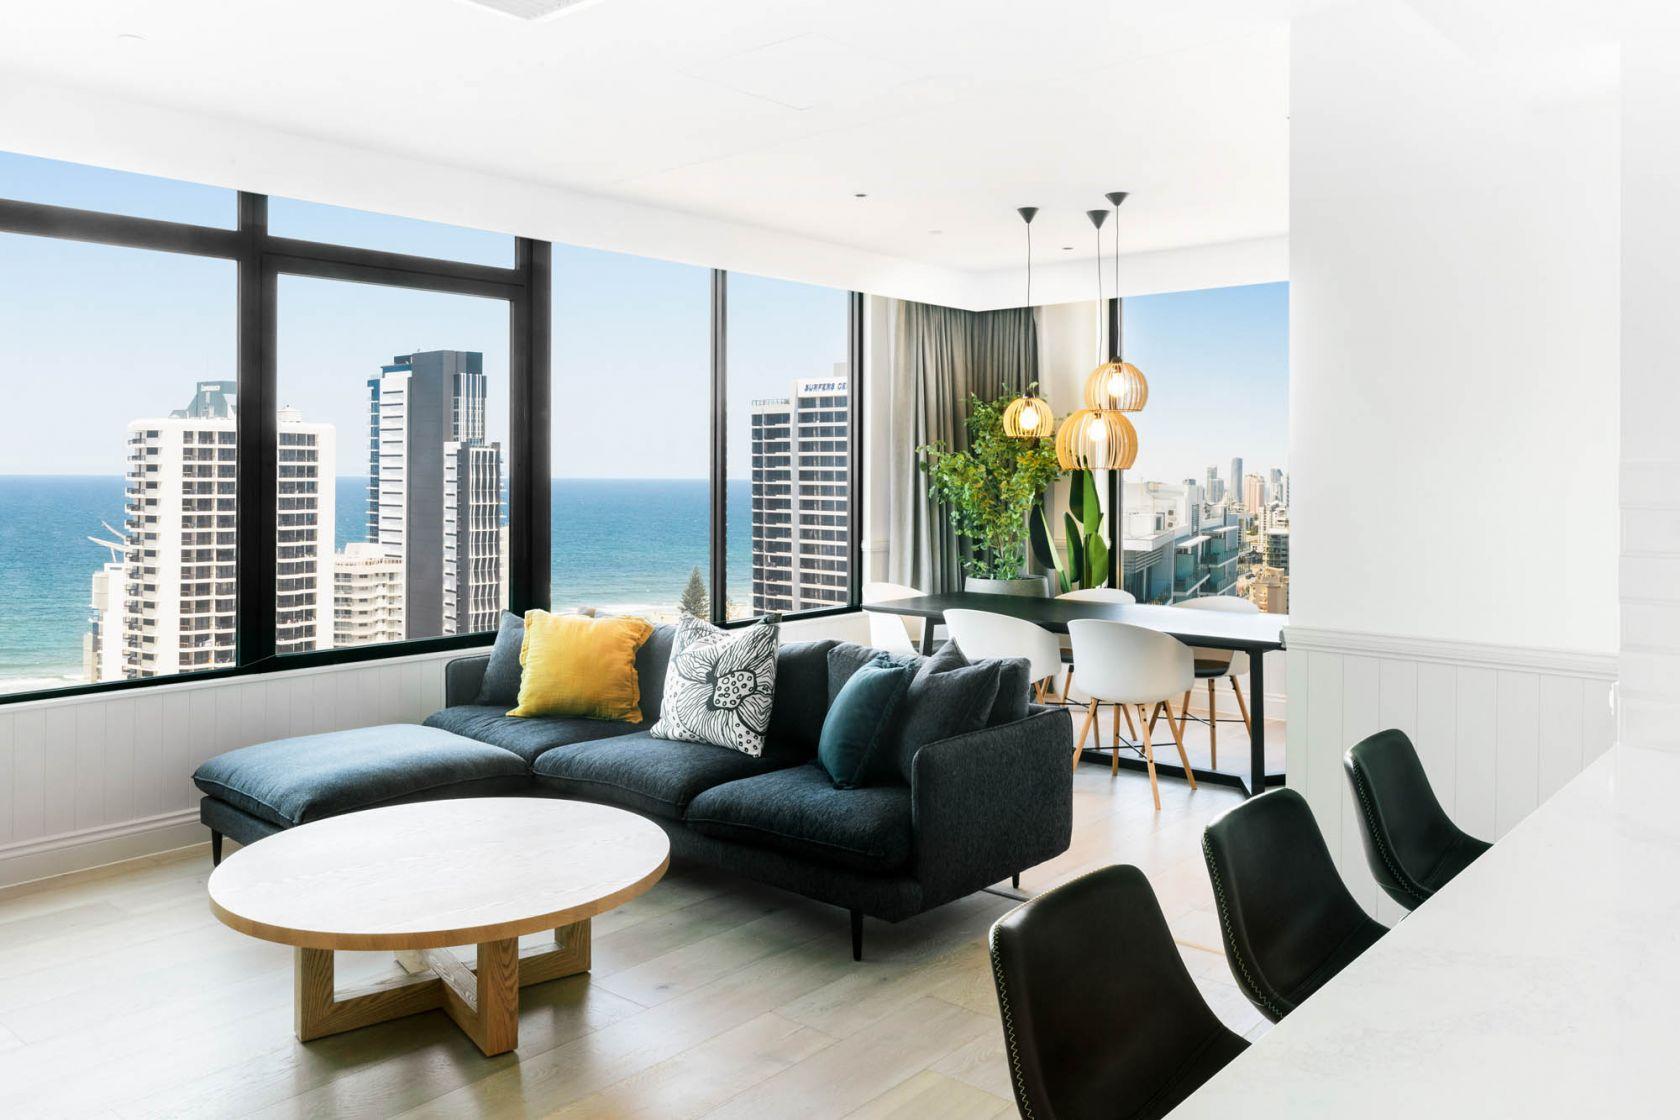 voco Gold Coast Hotel